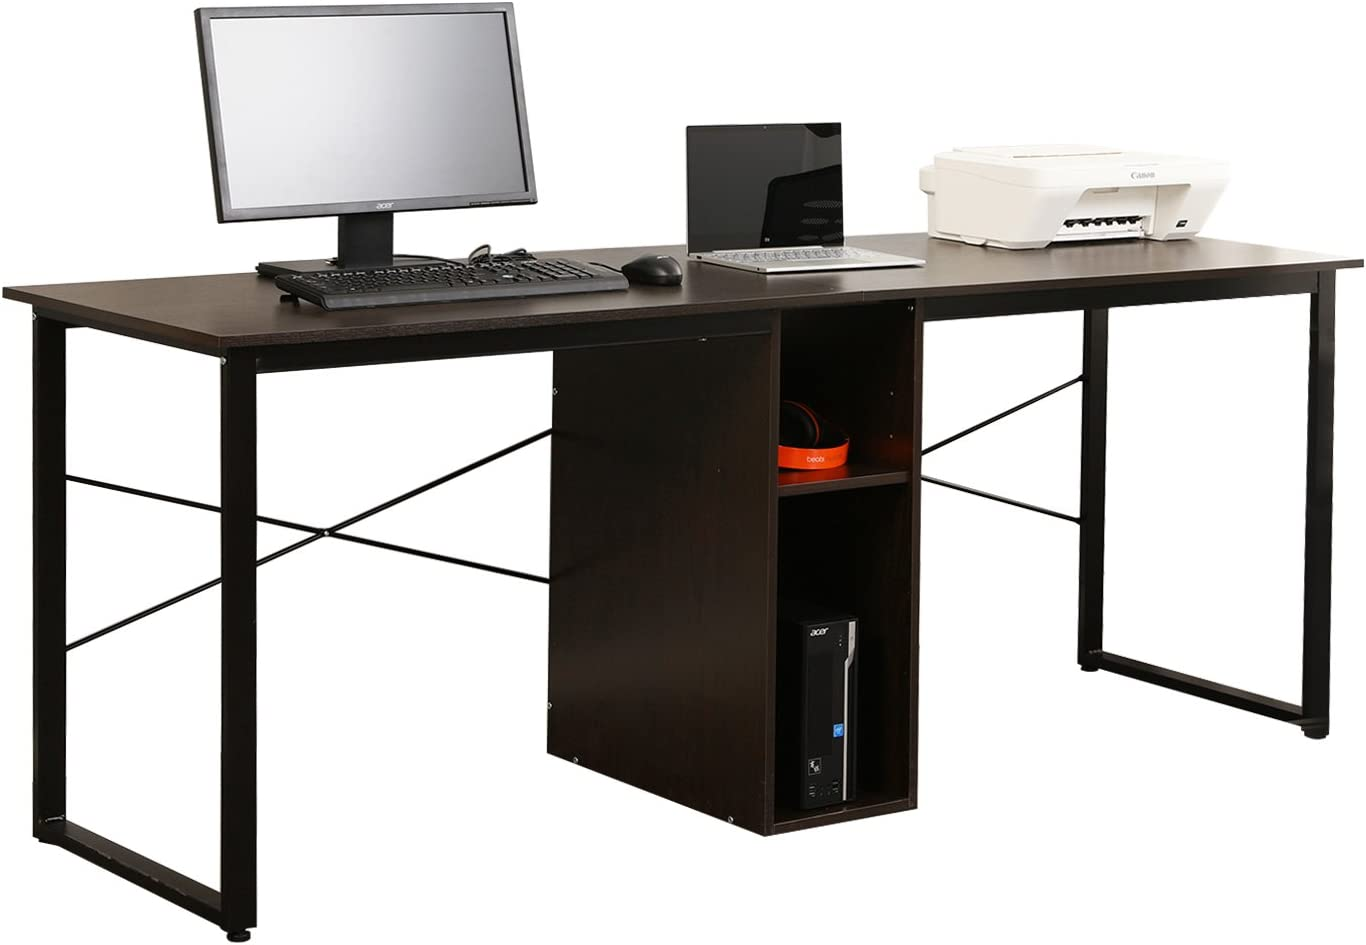 Soges Large Dual Desk 2-Person Workstation Desk 78 inches Double Computer Desk with Storage Box Home Office Desk Writing Desk Teens Desk Black LD-H01BK